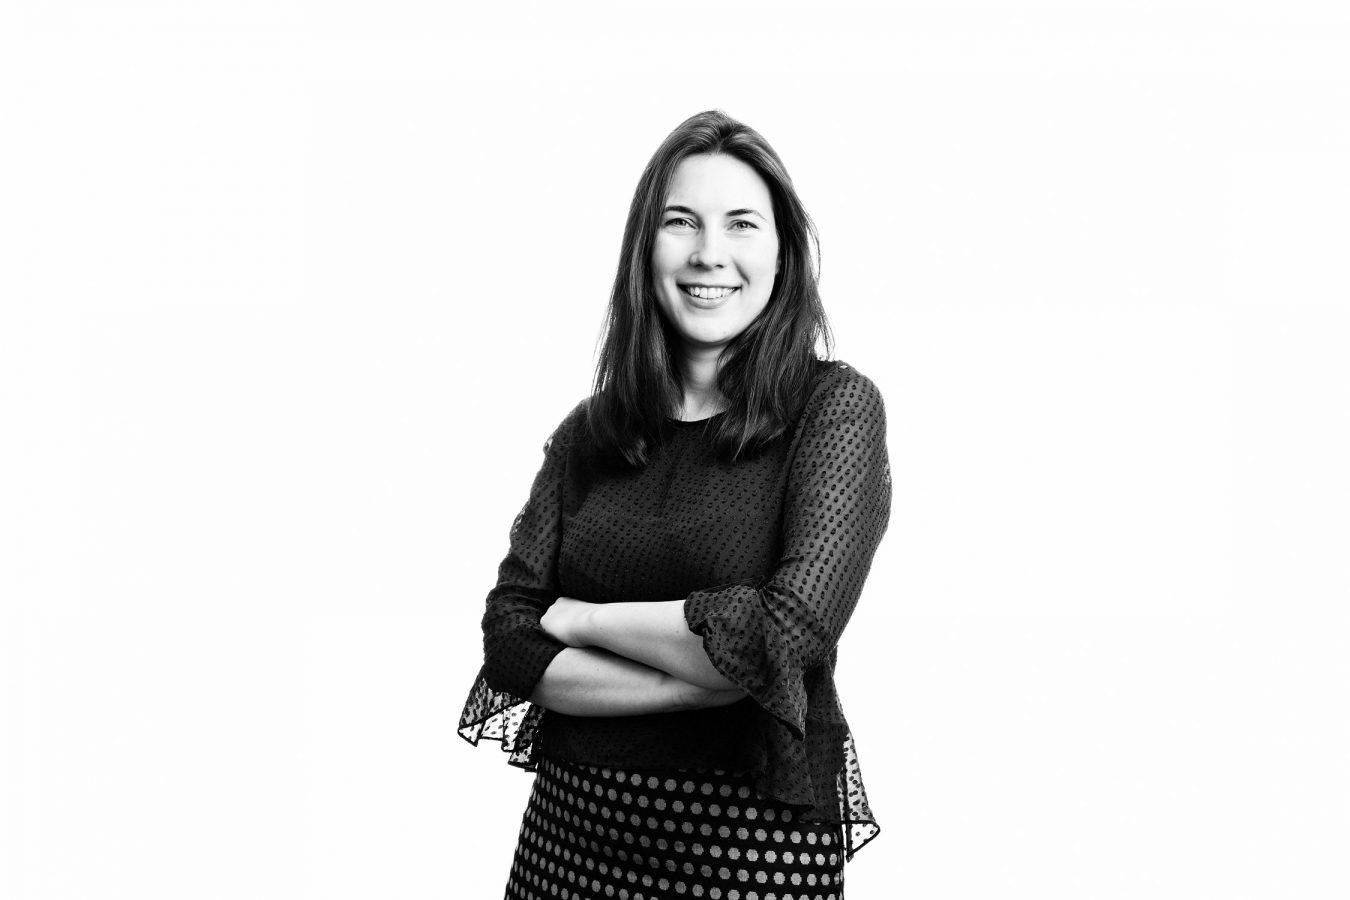 Taylor-Vinters-staff-portrait-studio-black-and-white-london-woman